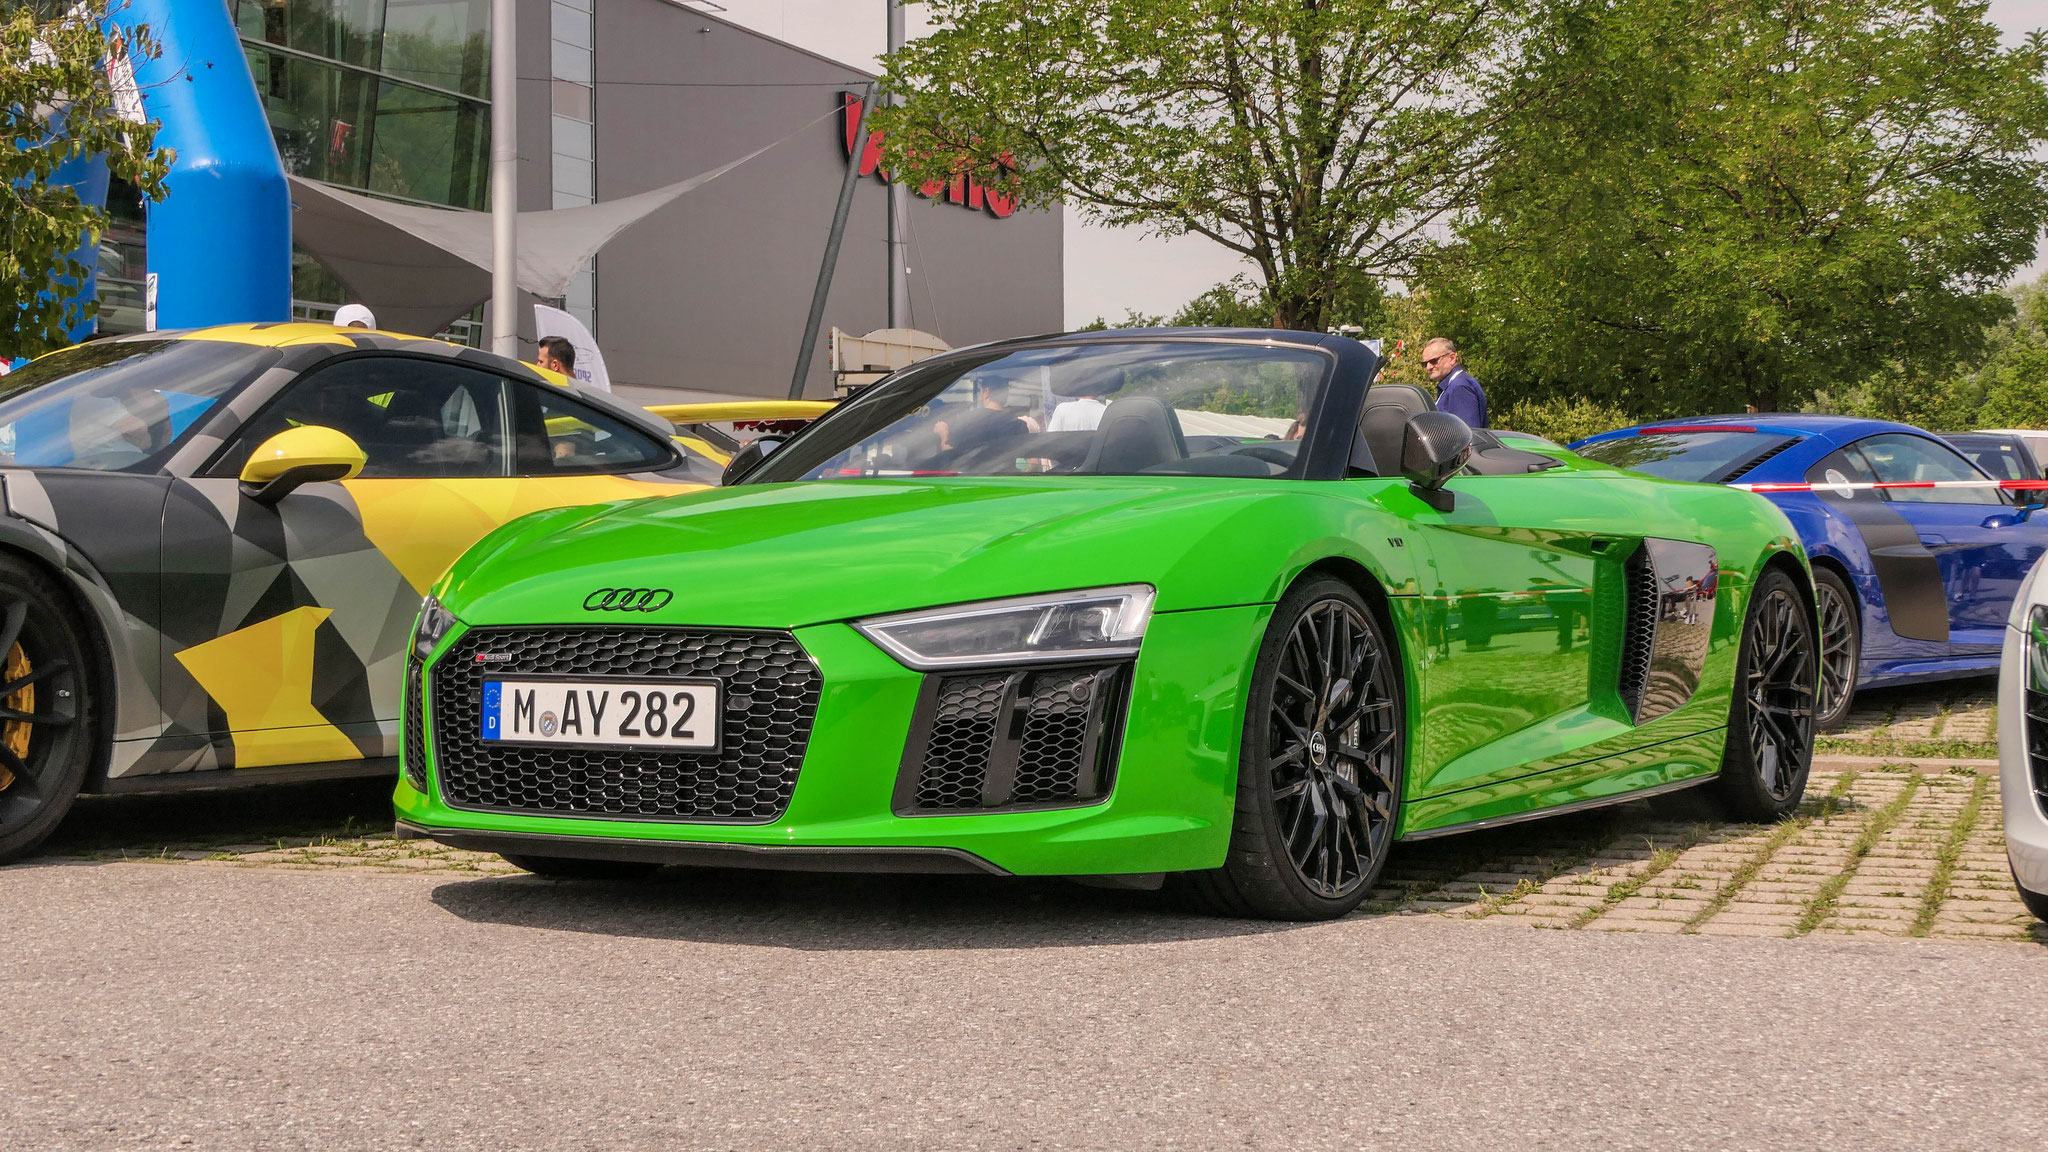 Audi R8 V10 Spyder - M-AY-282